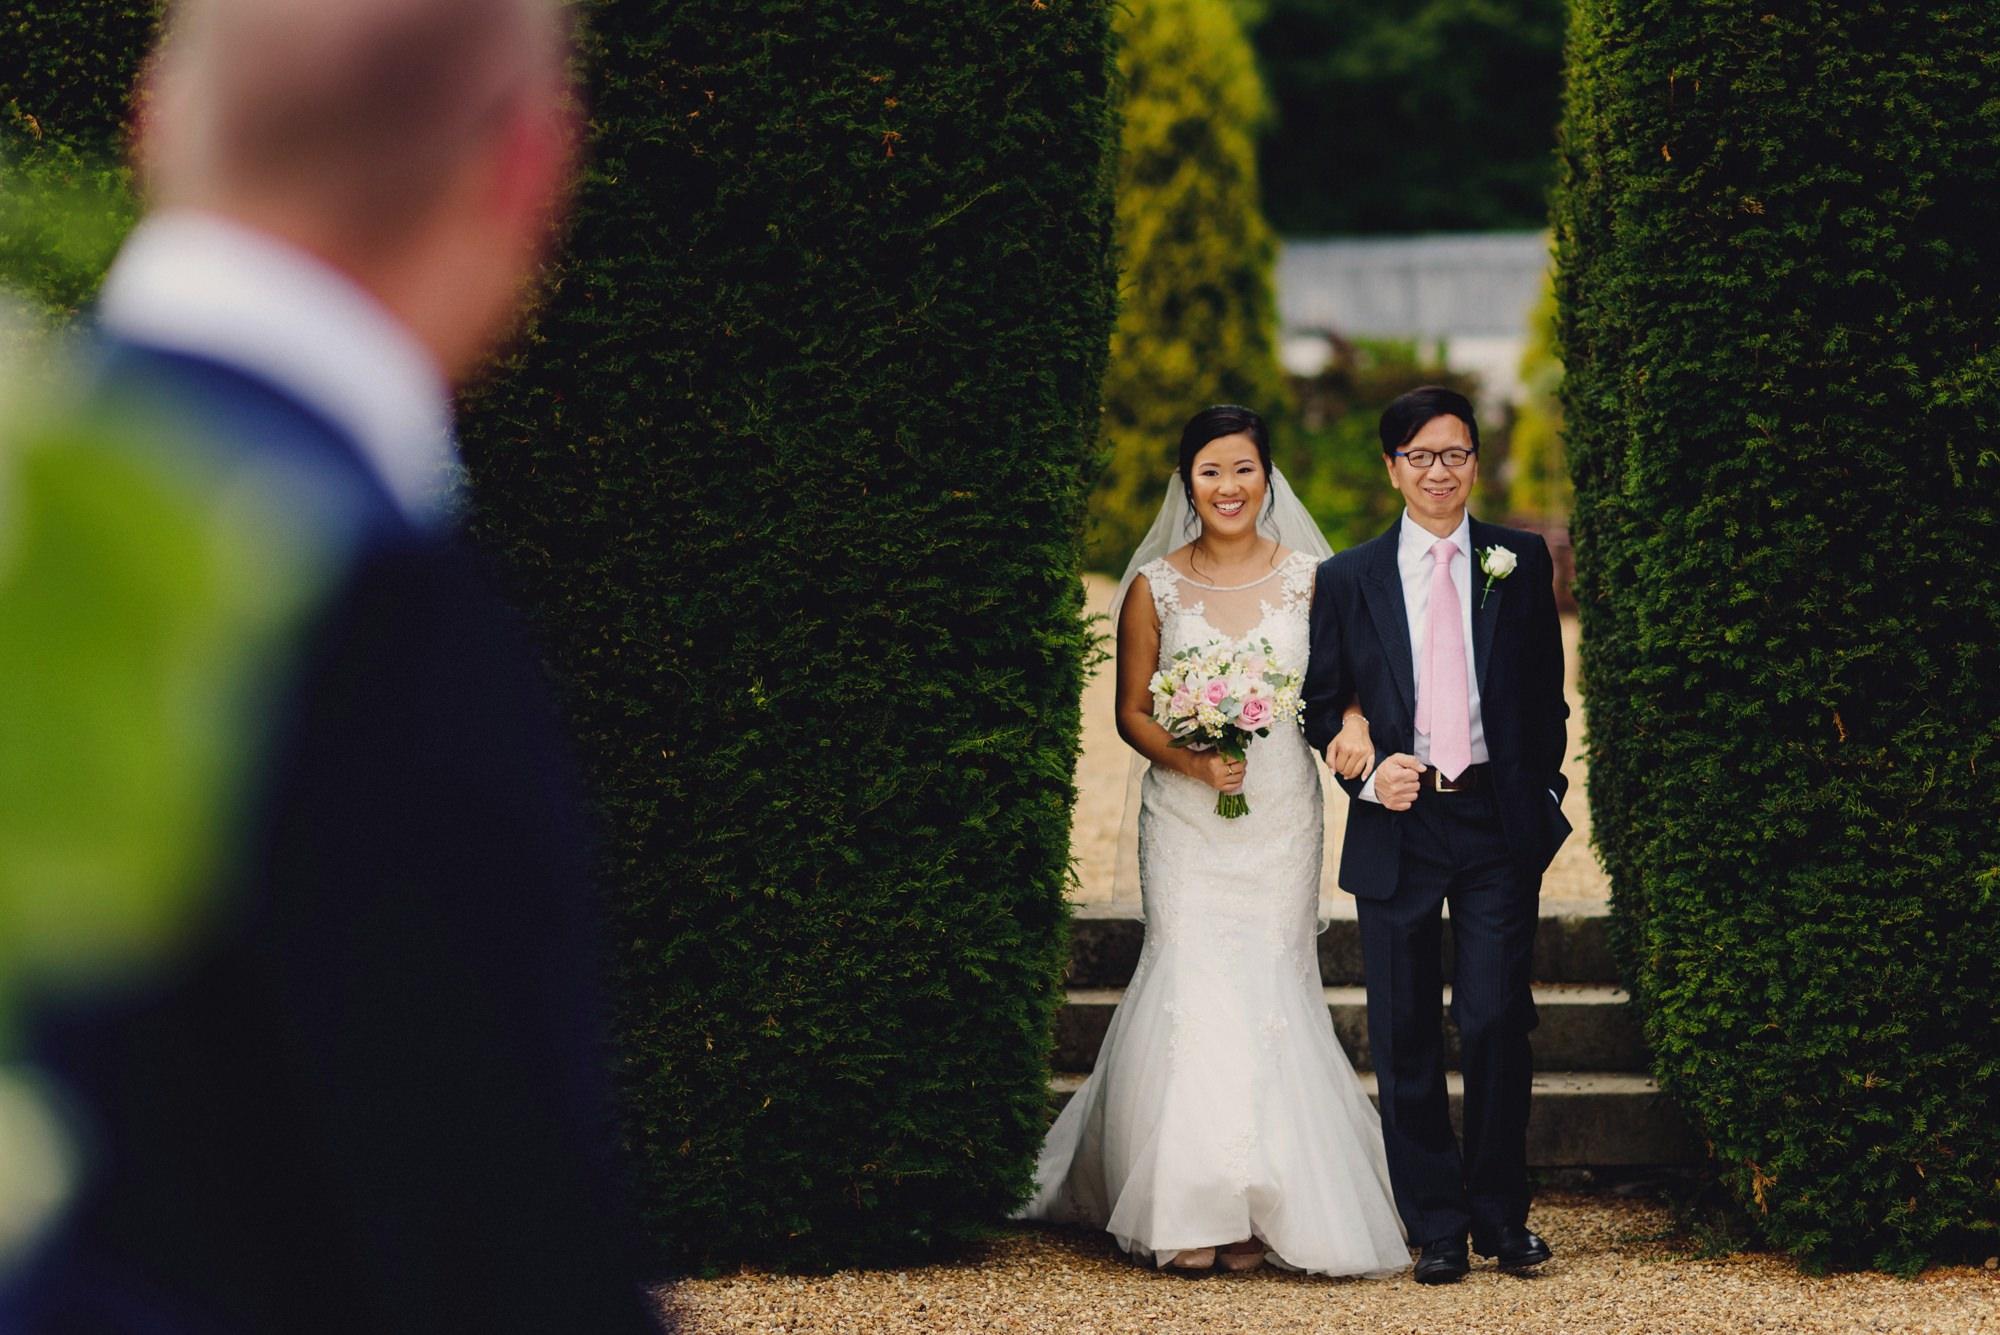 Award Winning UK Wedding Photographer